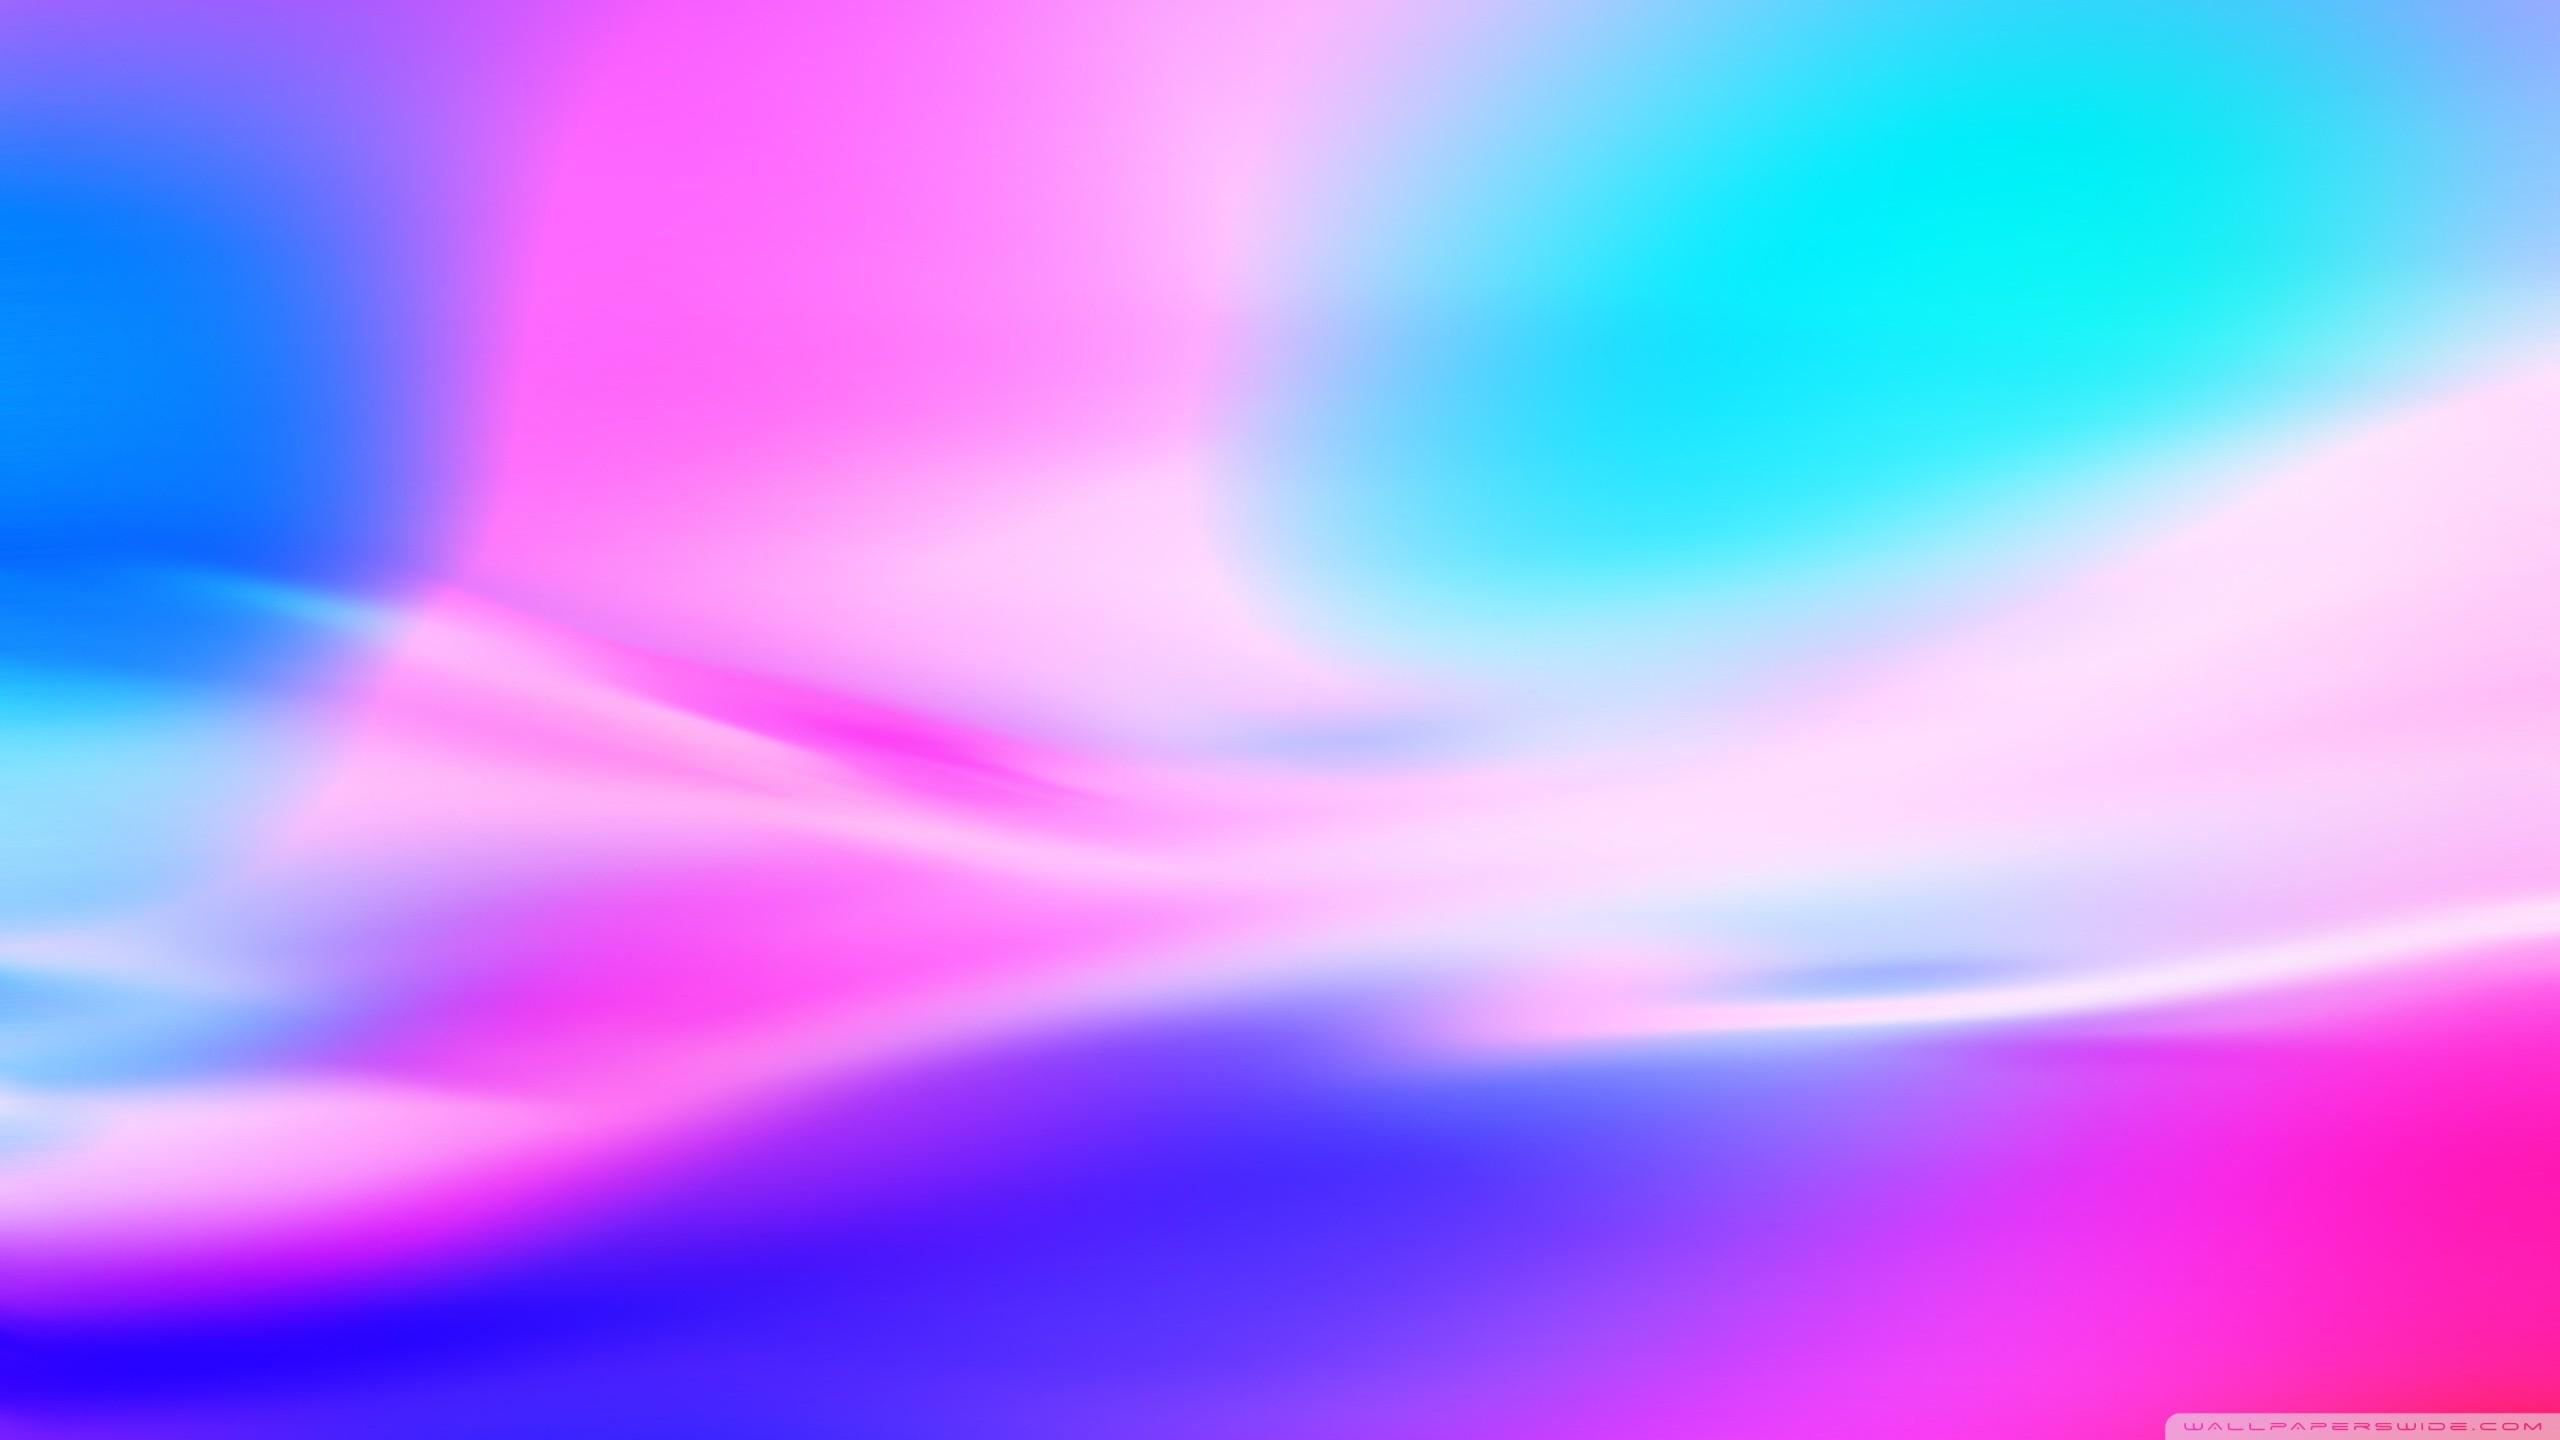 … Pink Wallpaper (18) …